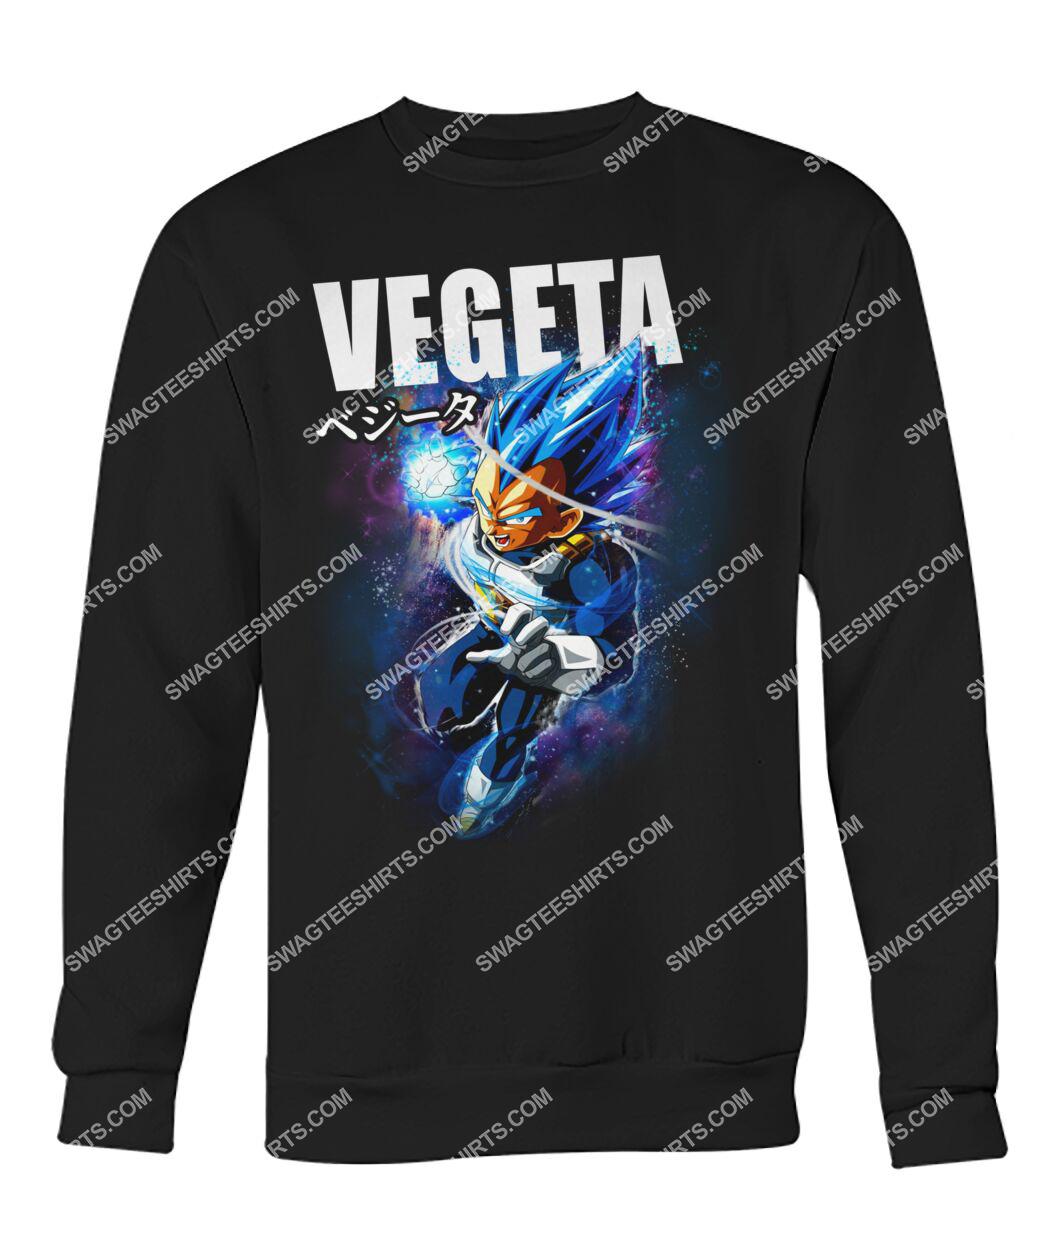 dragon ball z vegeta super saiyan sweatshirt 1